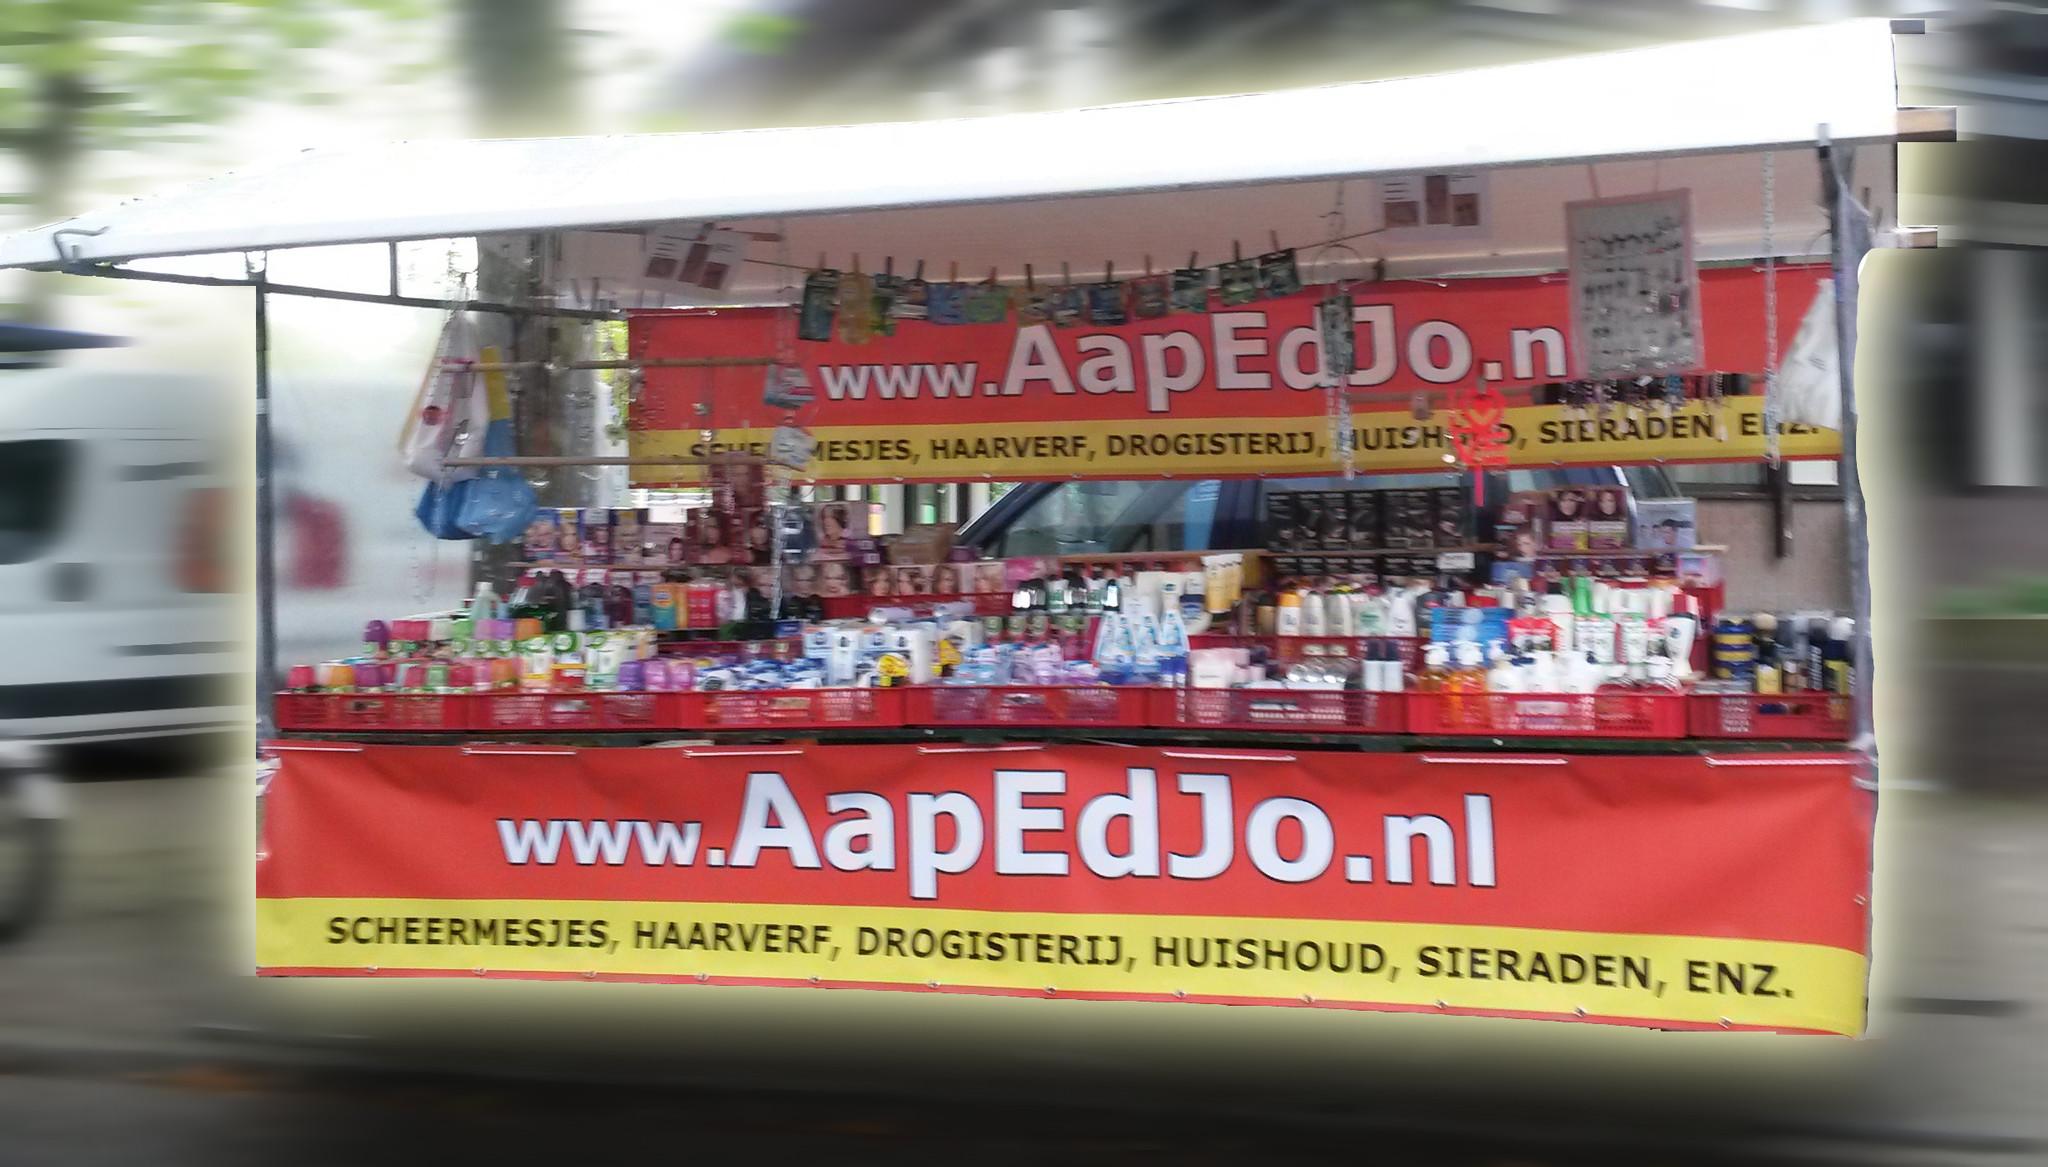 marktkraam AapEdJo.nl